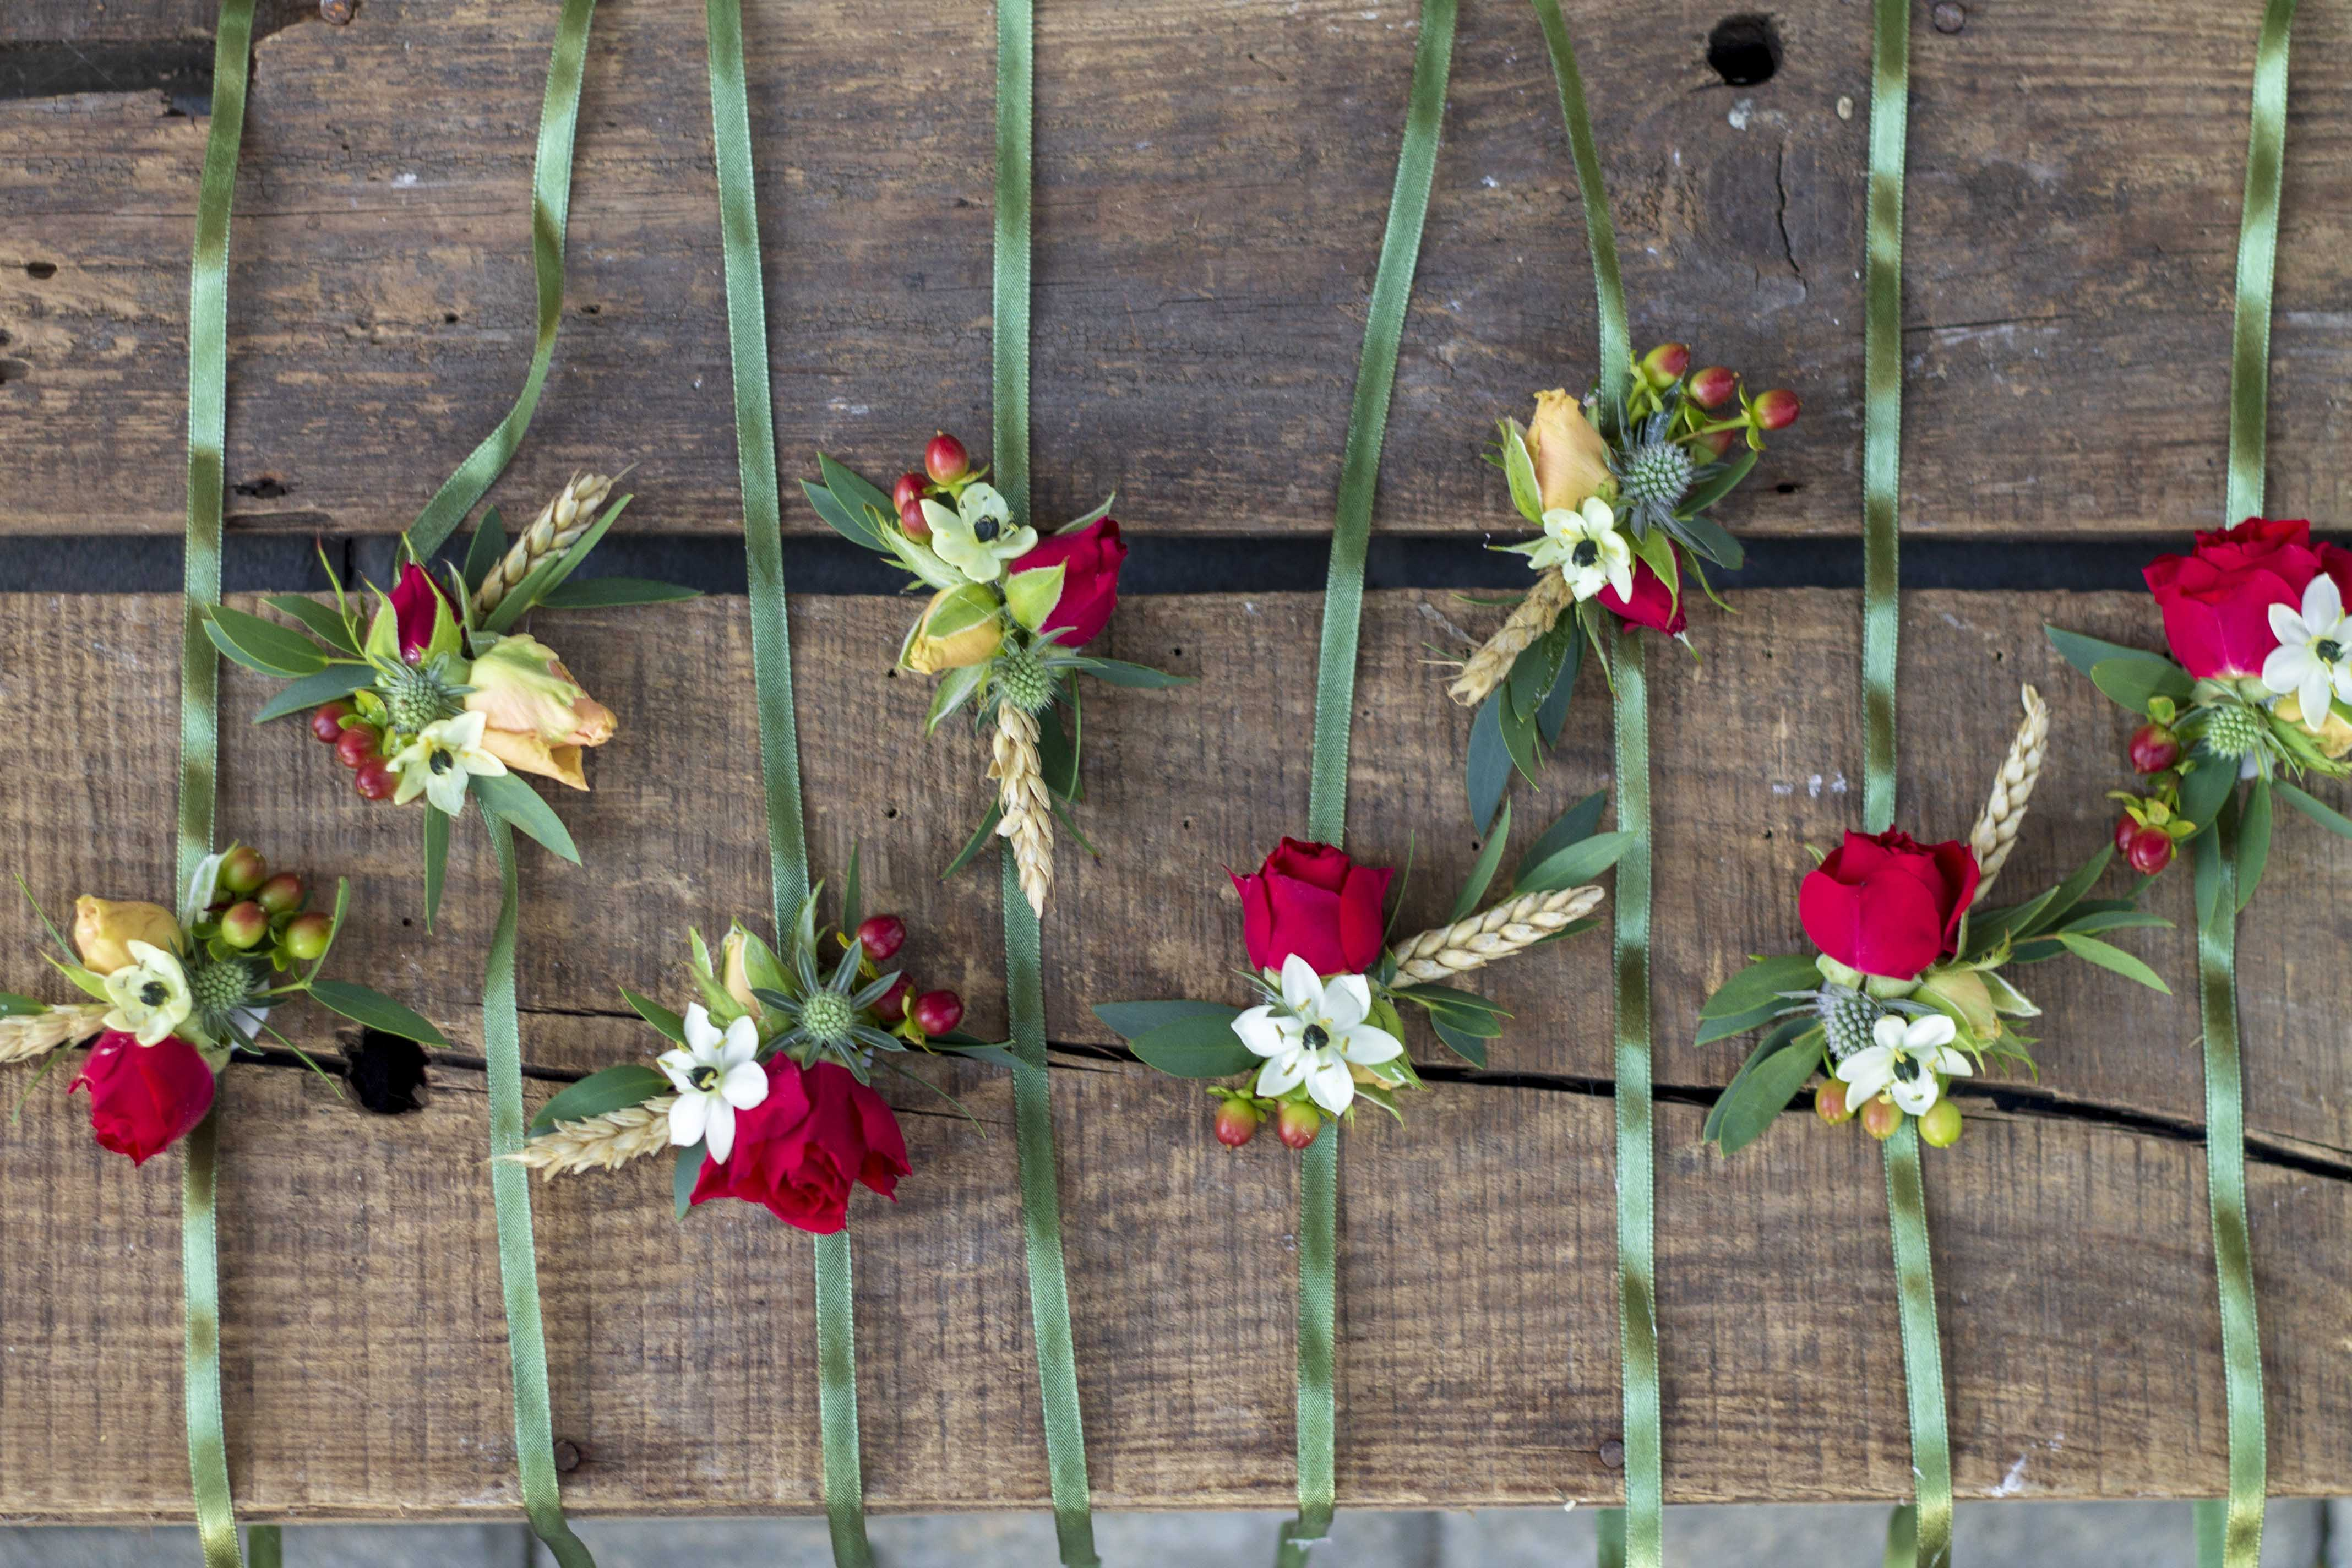 приказна-градина-сватбена–декорация-мак–студио-_30 (26)